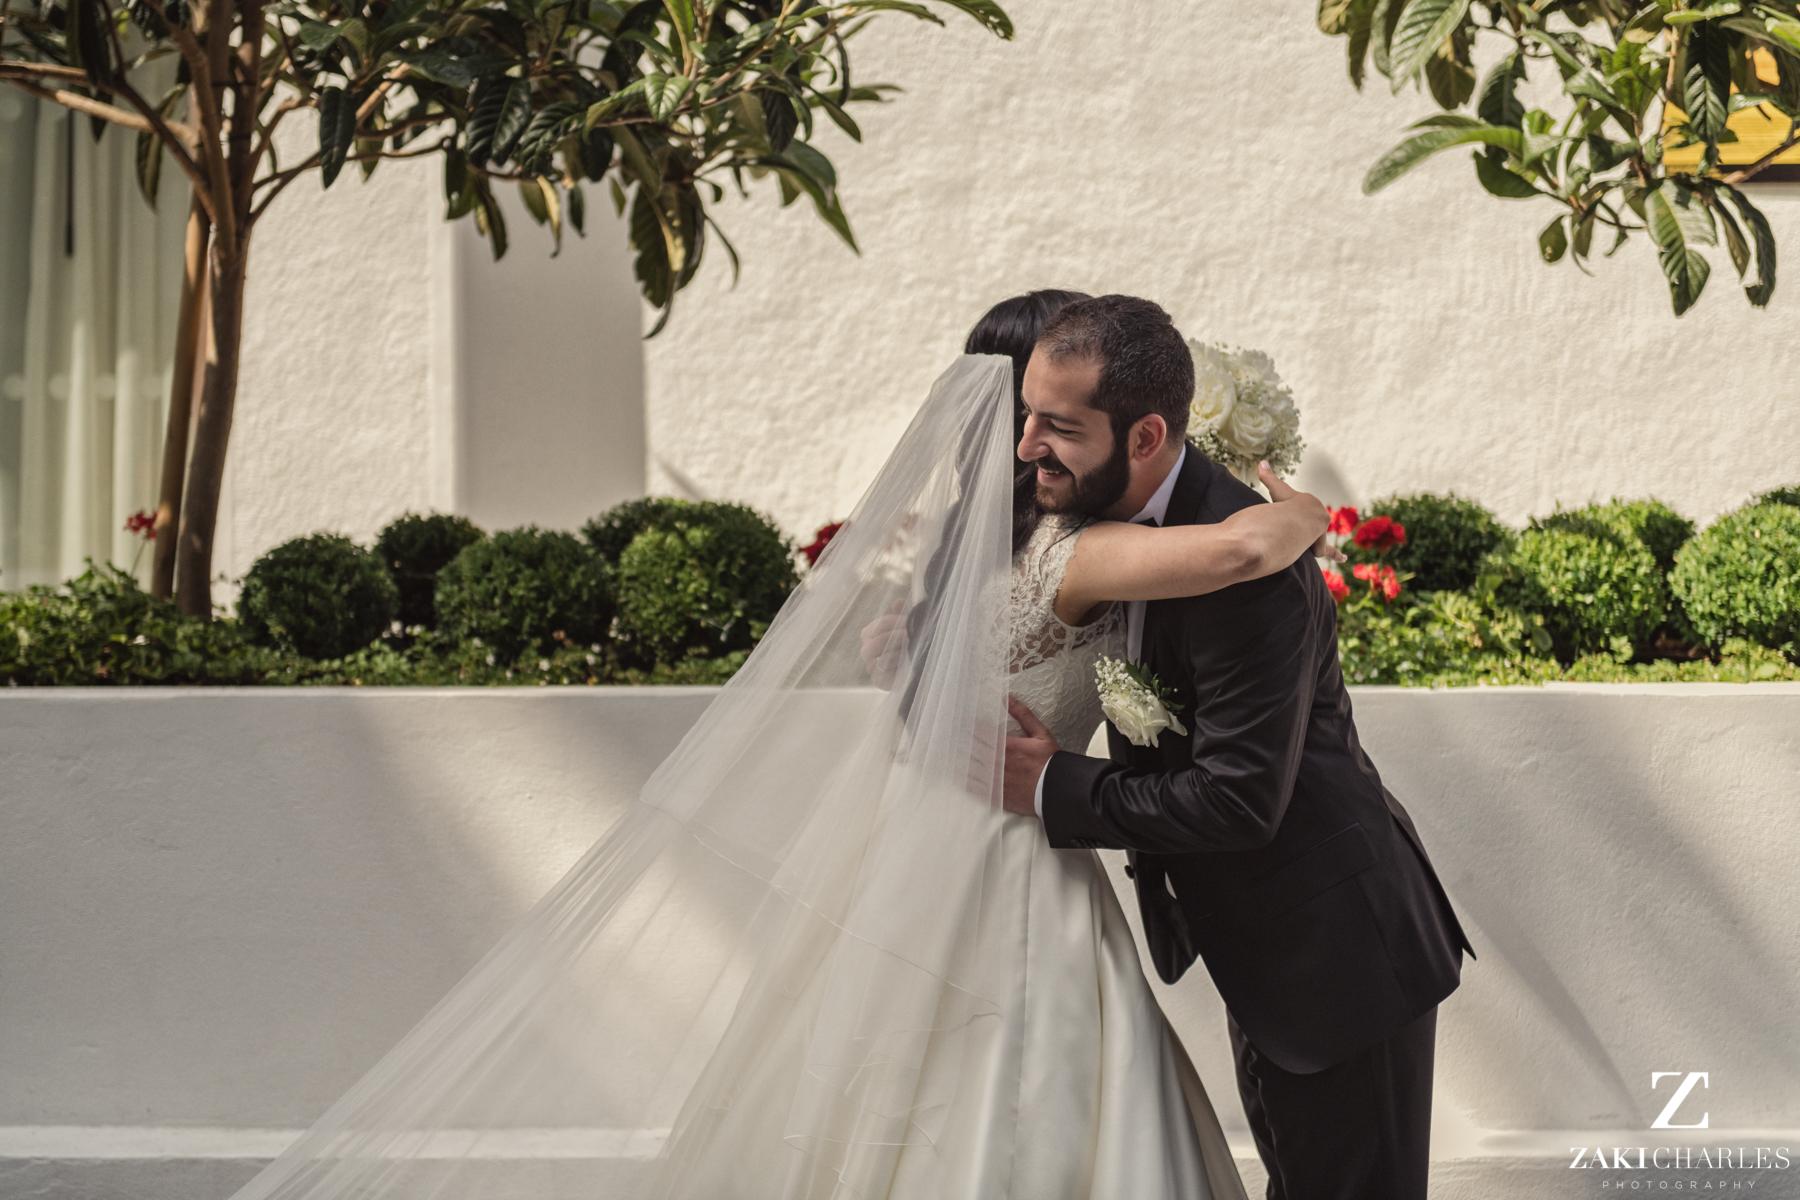 First look between Bride and Groom 7